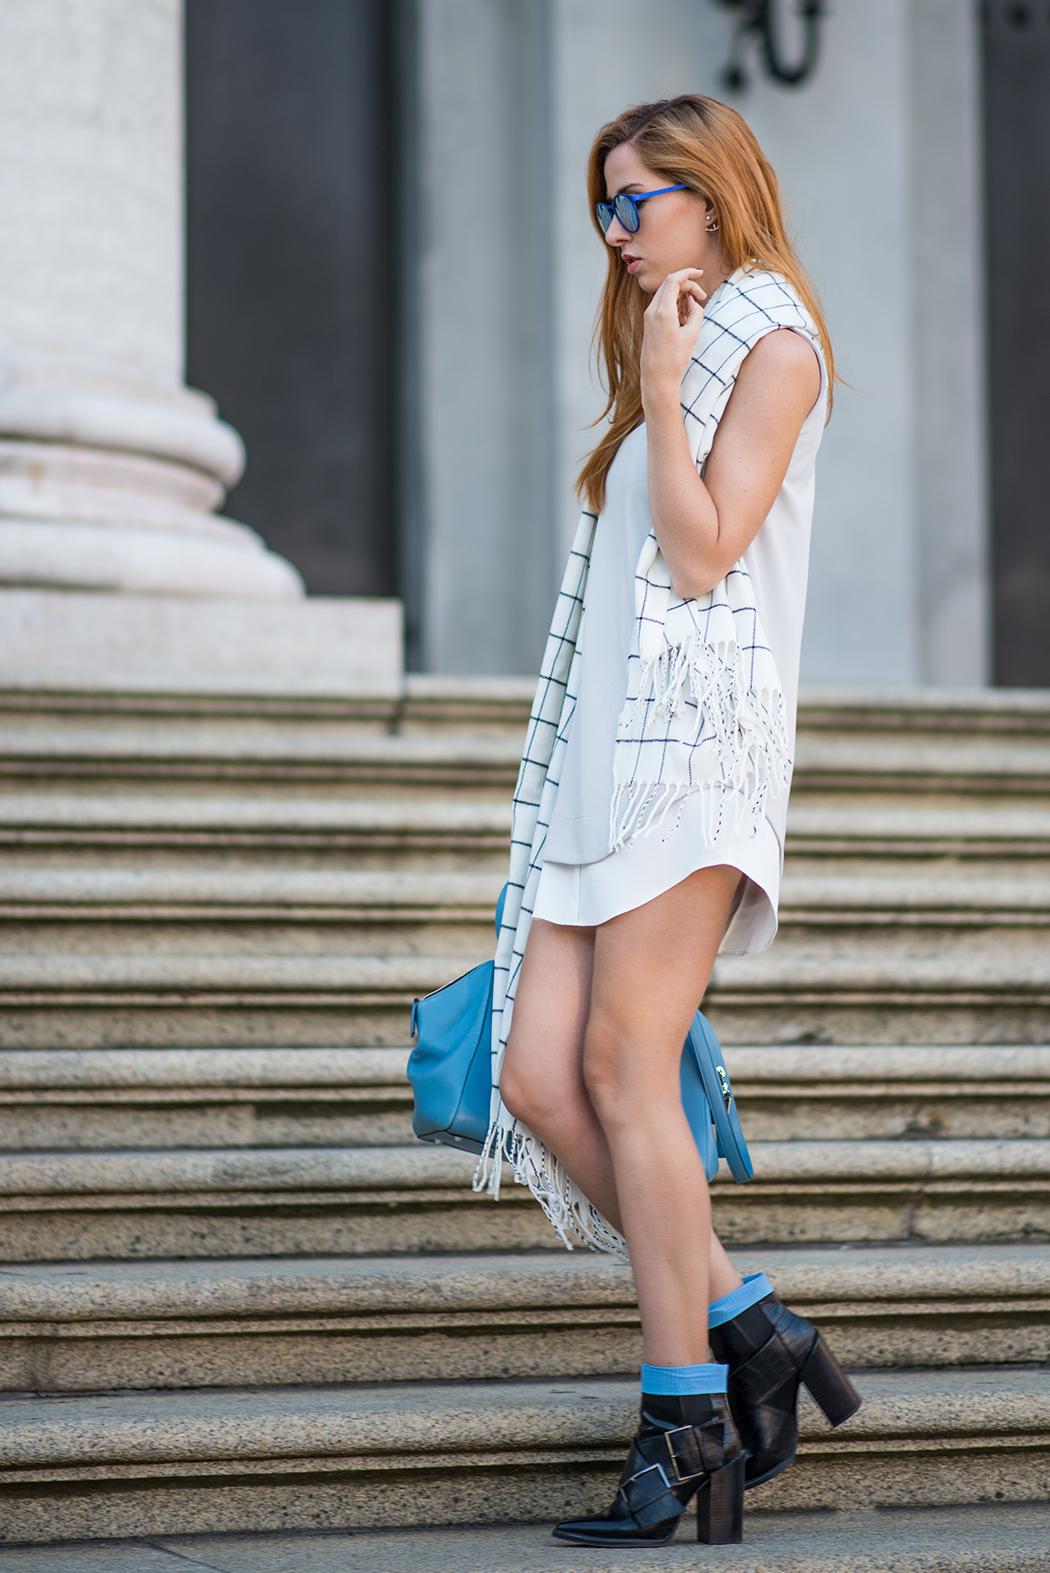 Fashionblog-Fashionblogger-München-Deutschland-Fashion-Blog-Lifestyle-Lindarella-Linda-Rella-Hemdkleid-Marc-Jacobs-Le_Specs-blau-verspiegelt-2-web